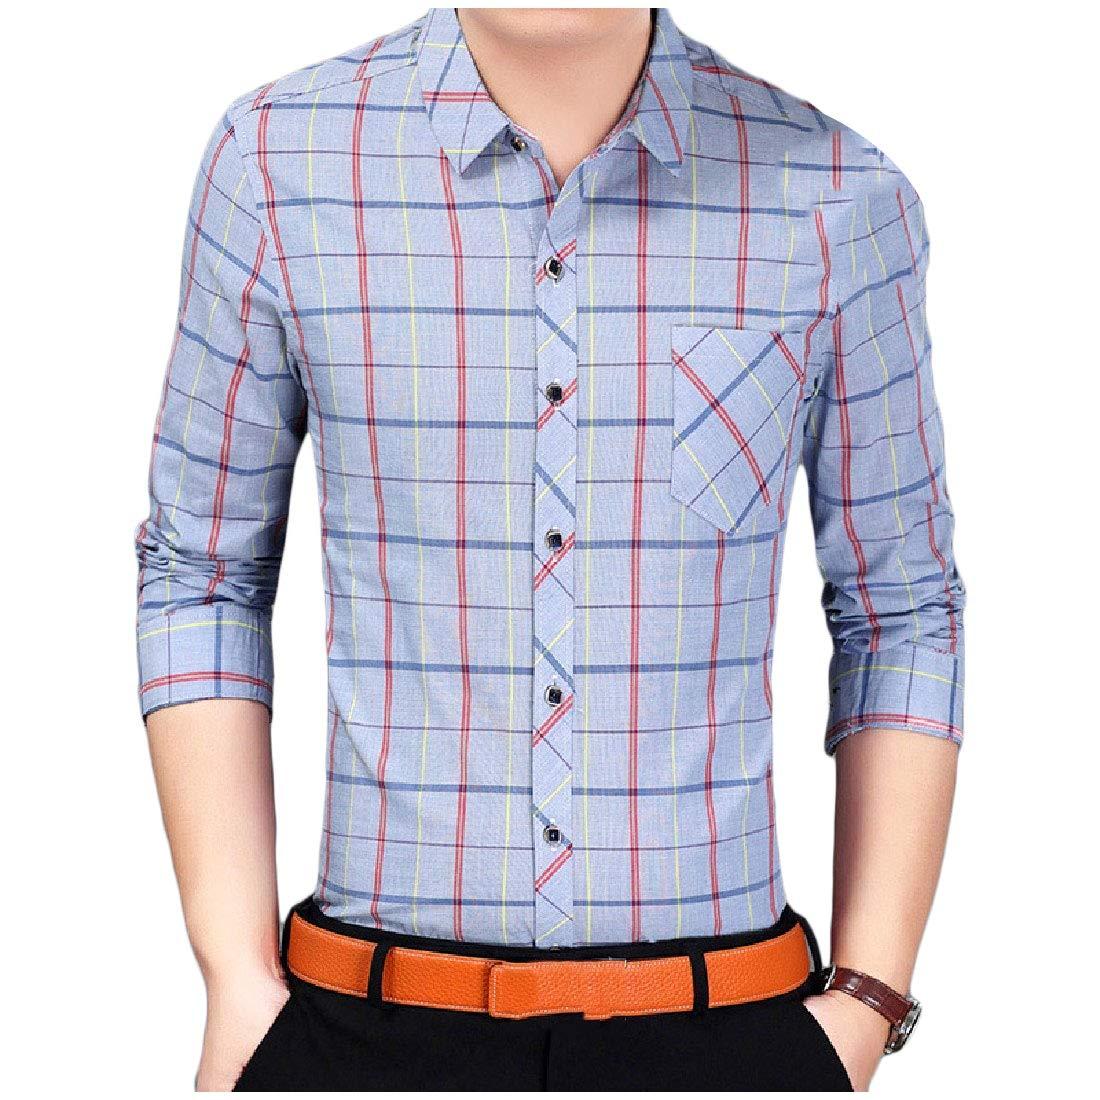 YUNY Mens Classic Plaid Winter Thick Casual Flat Collar Long Sleeve Shirt Blue S